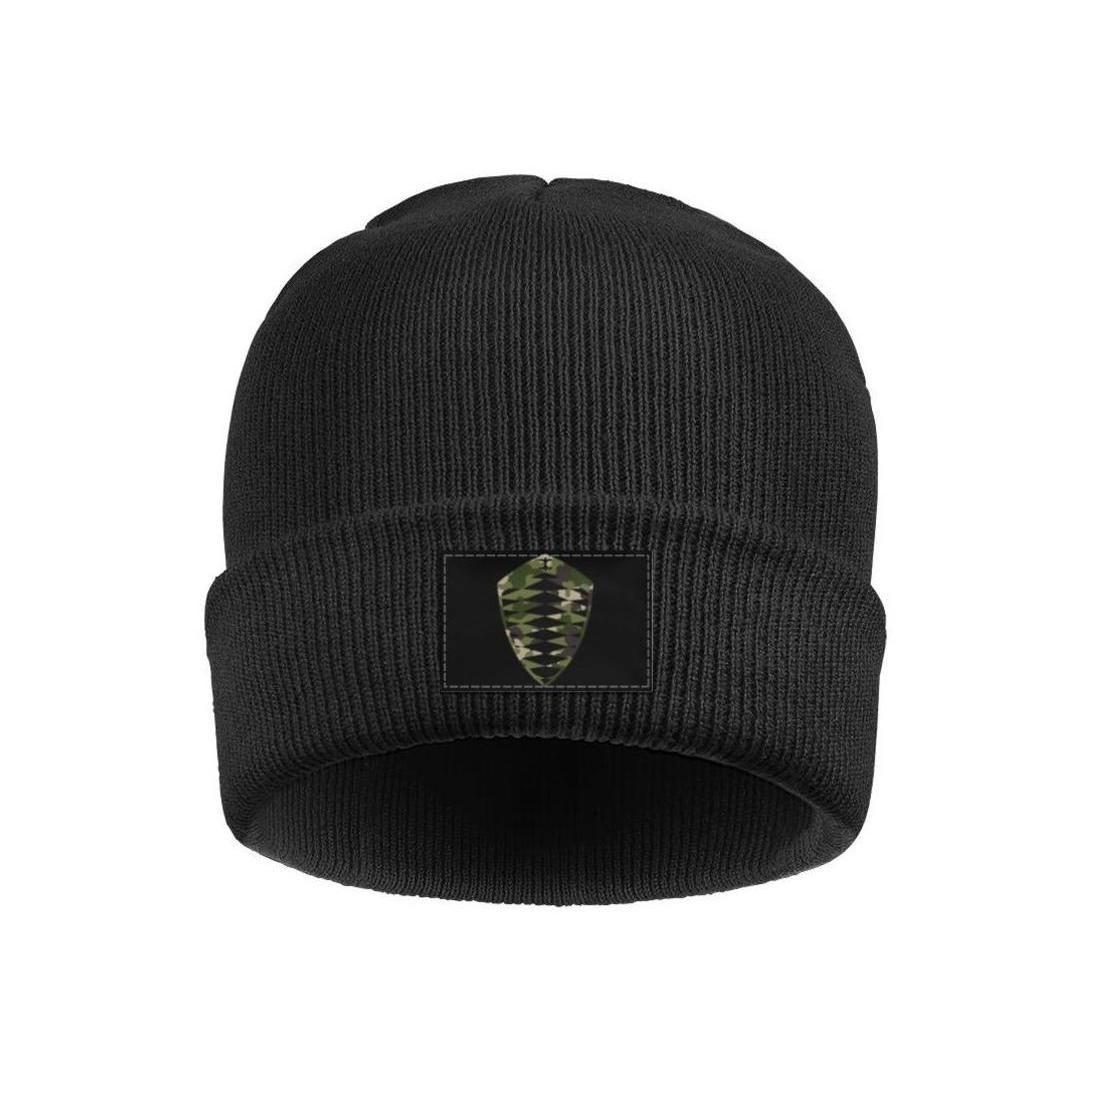 Koenigsegg black camouflage agera price Unisex Fine Knit Fits Under Helmets Cap Flash gold model car Distressed for sale logo American r